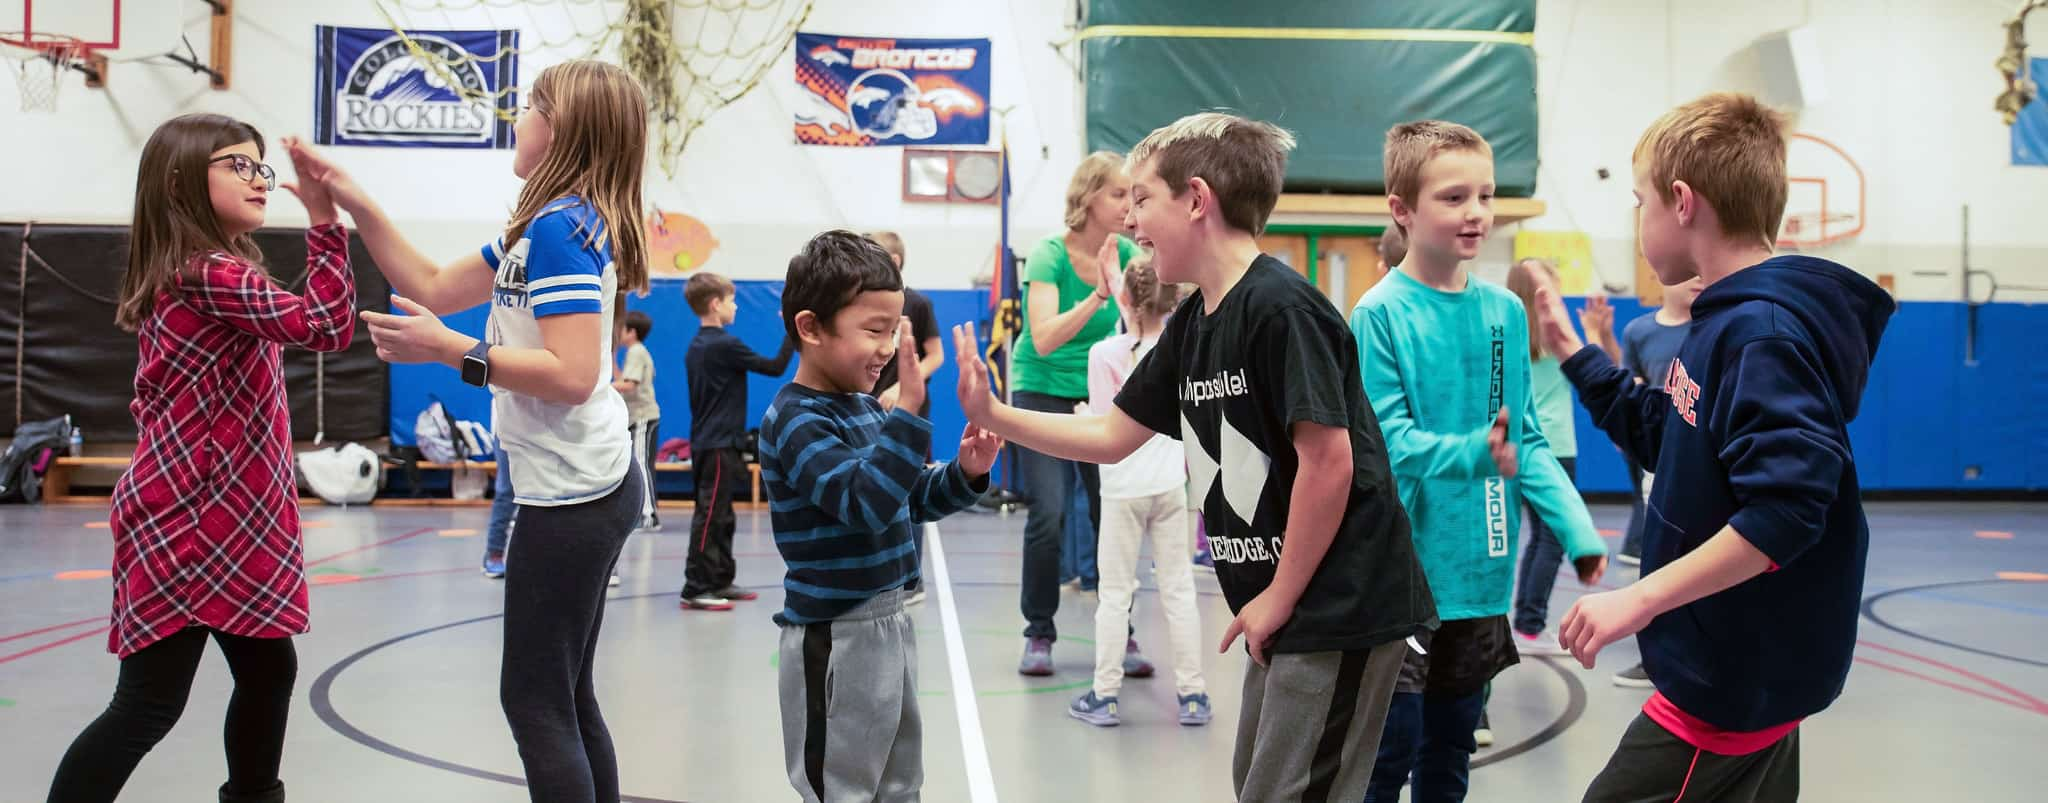 Niwot Elementary PE class